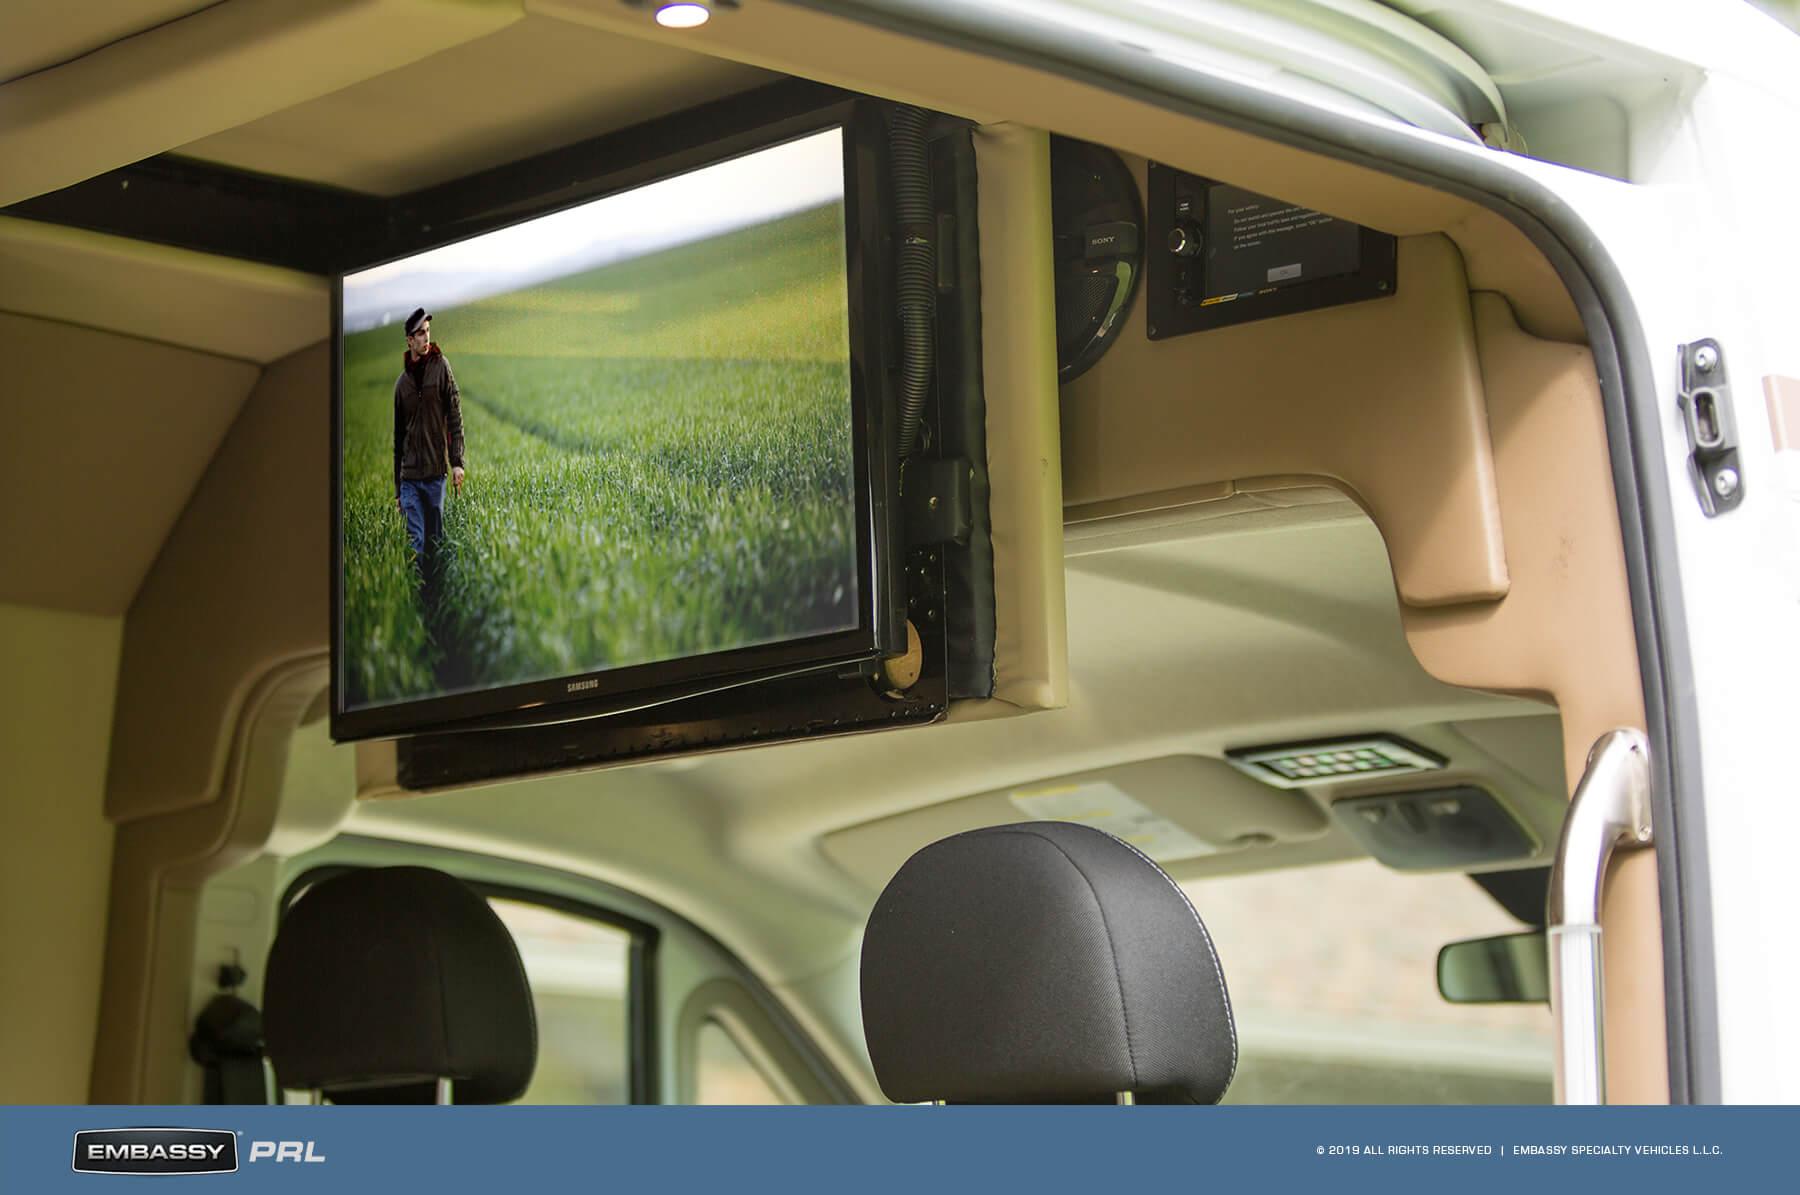 Embassy RV PRL Hide-away HDTV